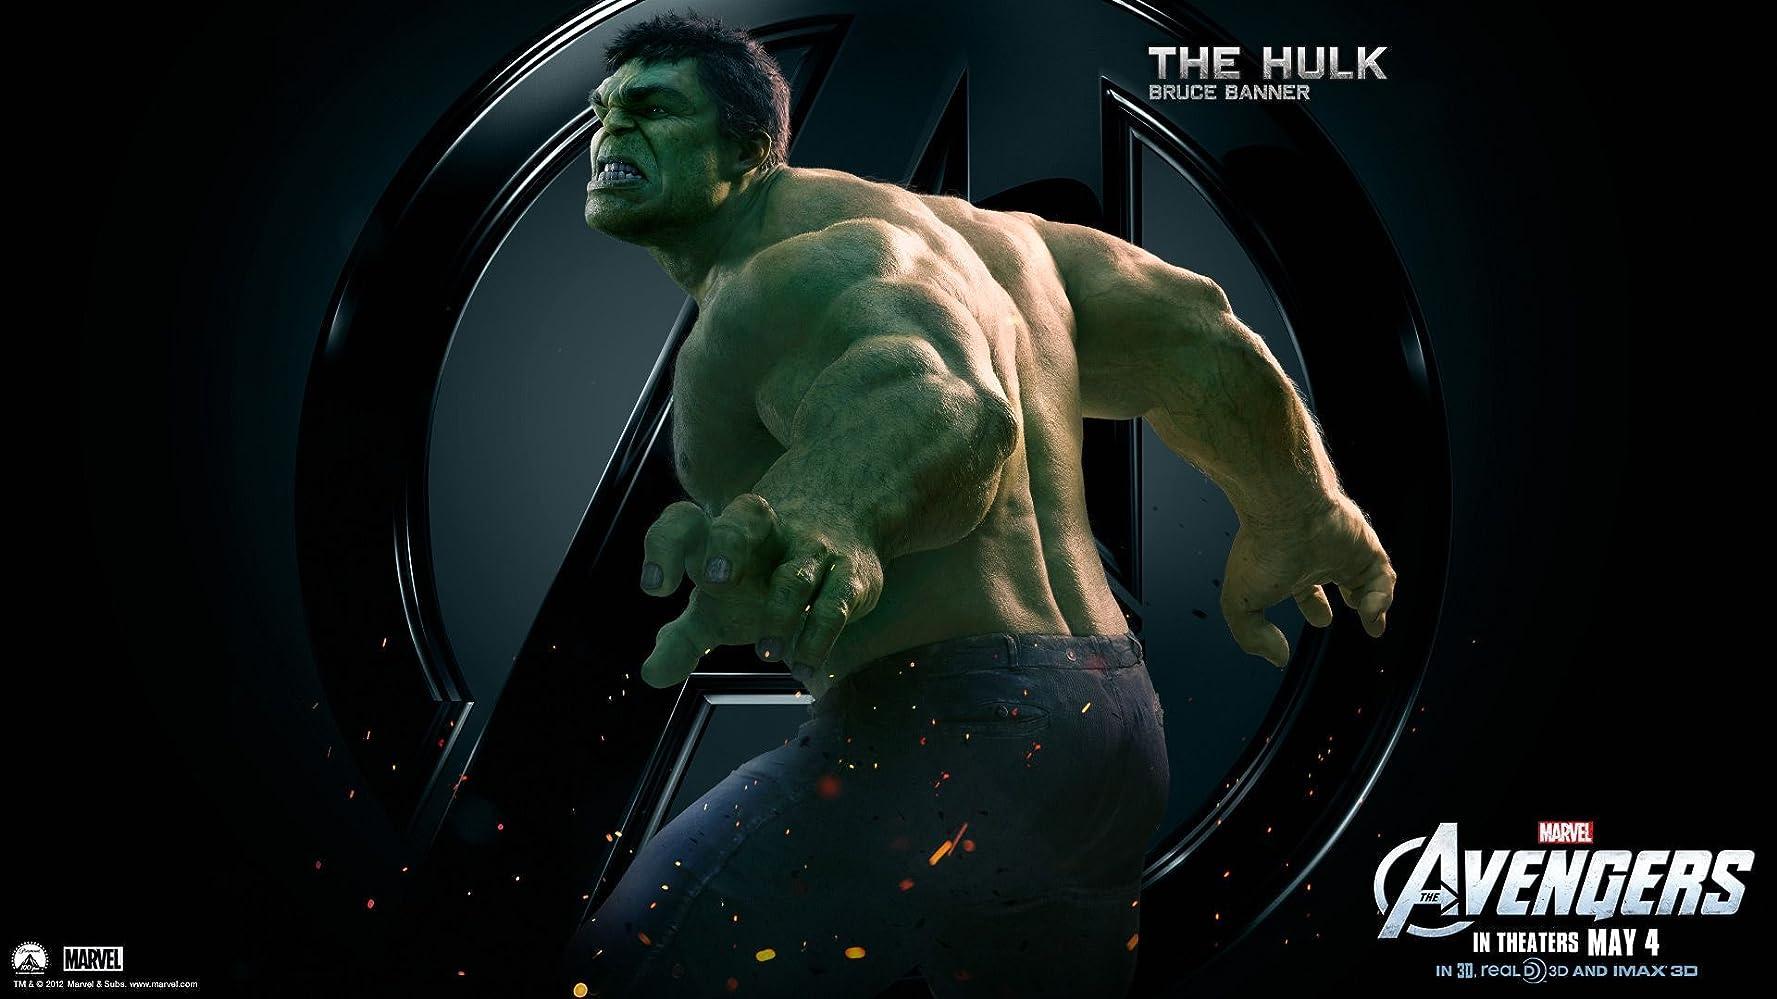 Mark Ruffalo in The Avengers (2012)